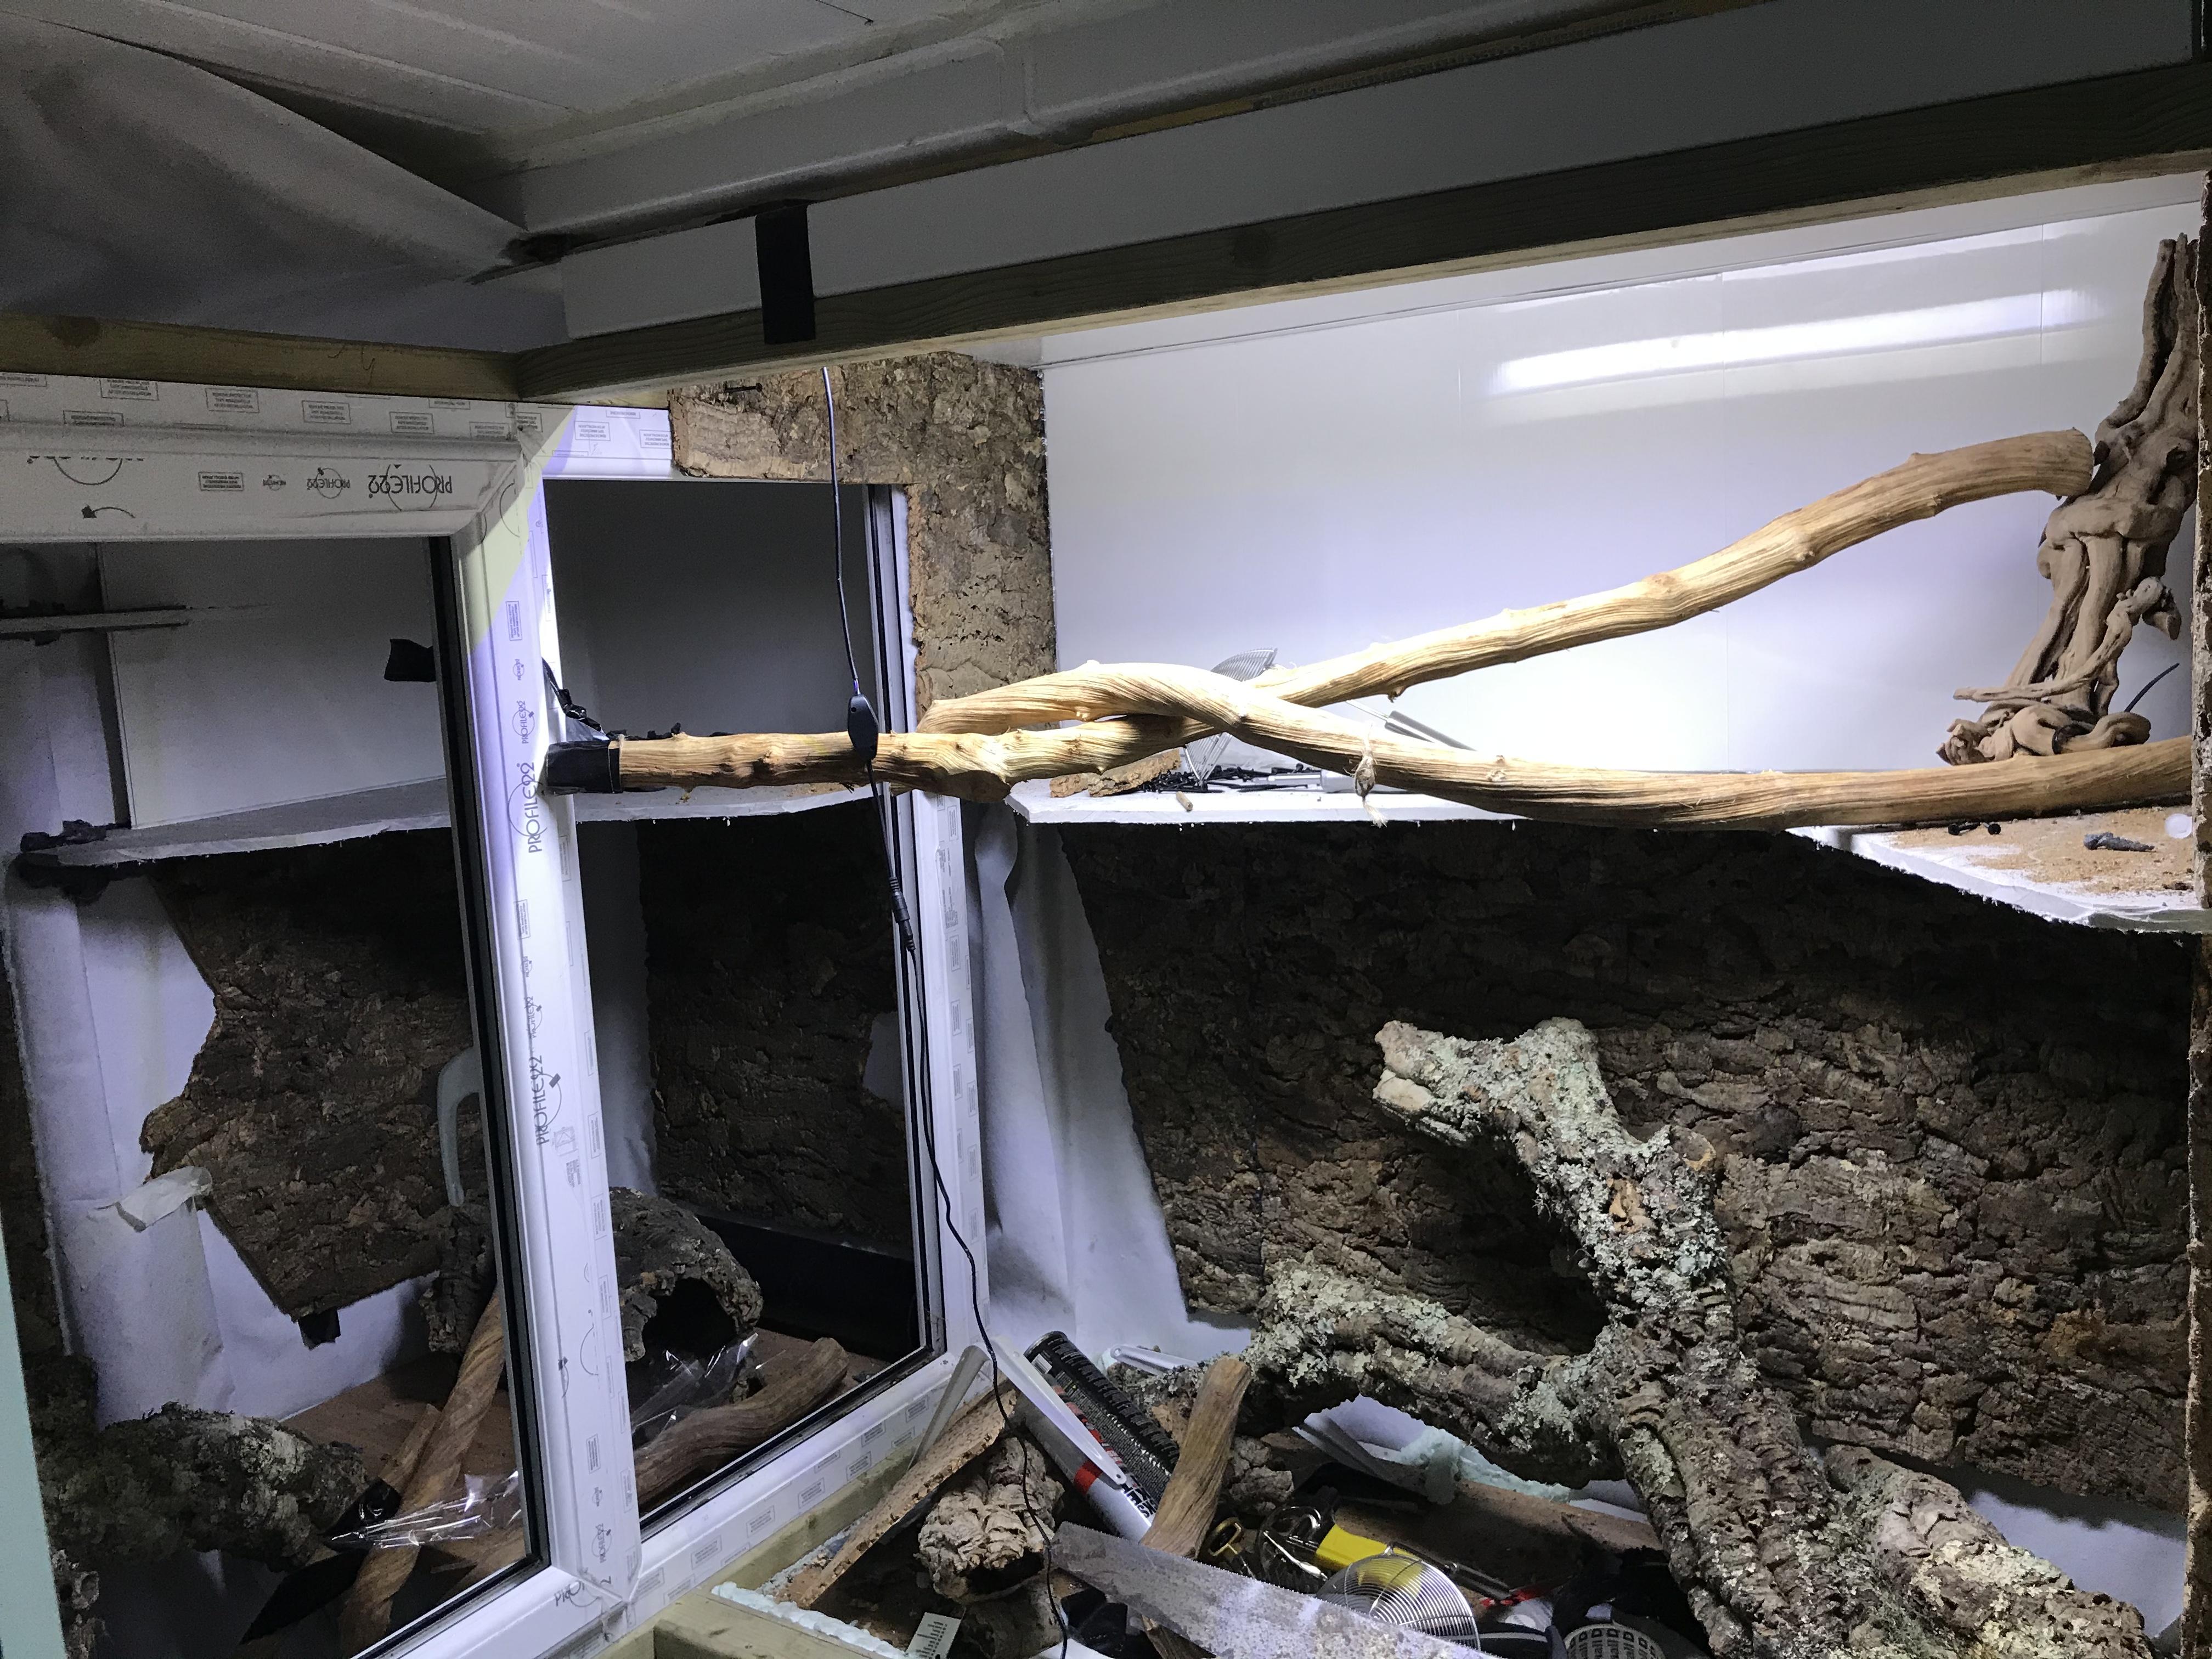 Man cave/python shed build-595e6c97-a1cd-47a6-8cbb-613bdbca3726_1605773674117.jpeg